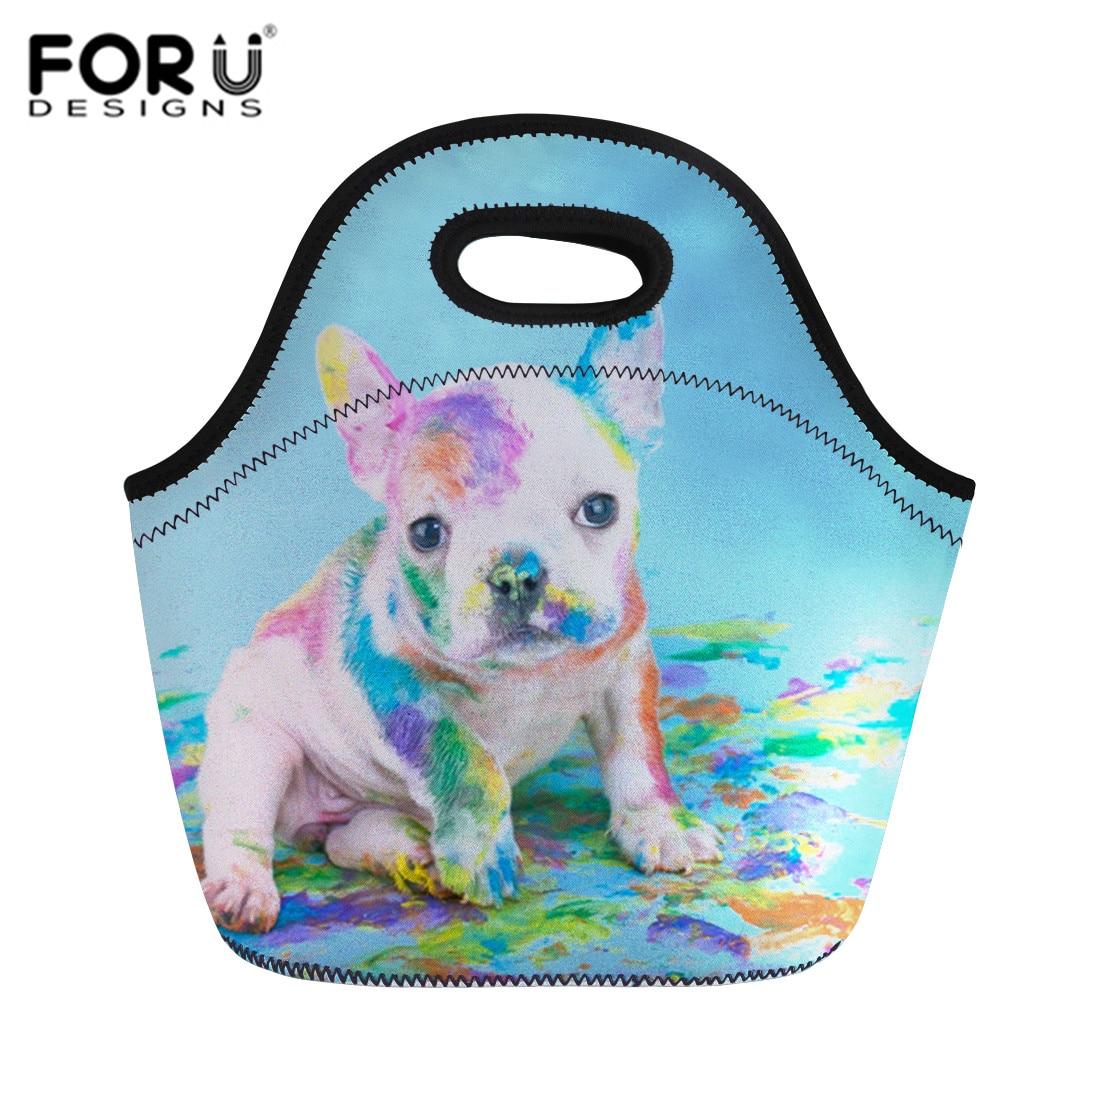 FORUDESIGNS Pugs Printed Neoprene Lunch Bags for Women High Quality Kids Snacks Tote Bag Waterproof Insulated Food Breakfast Box